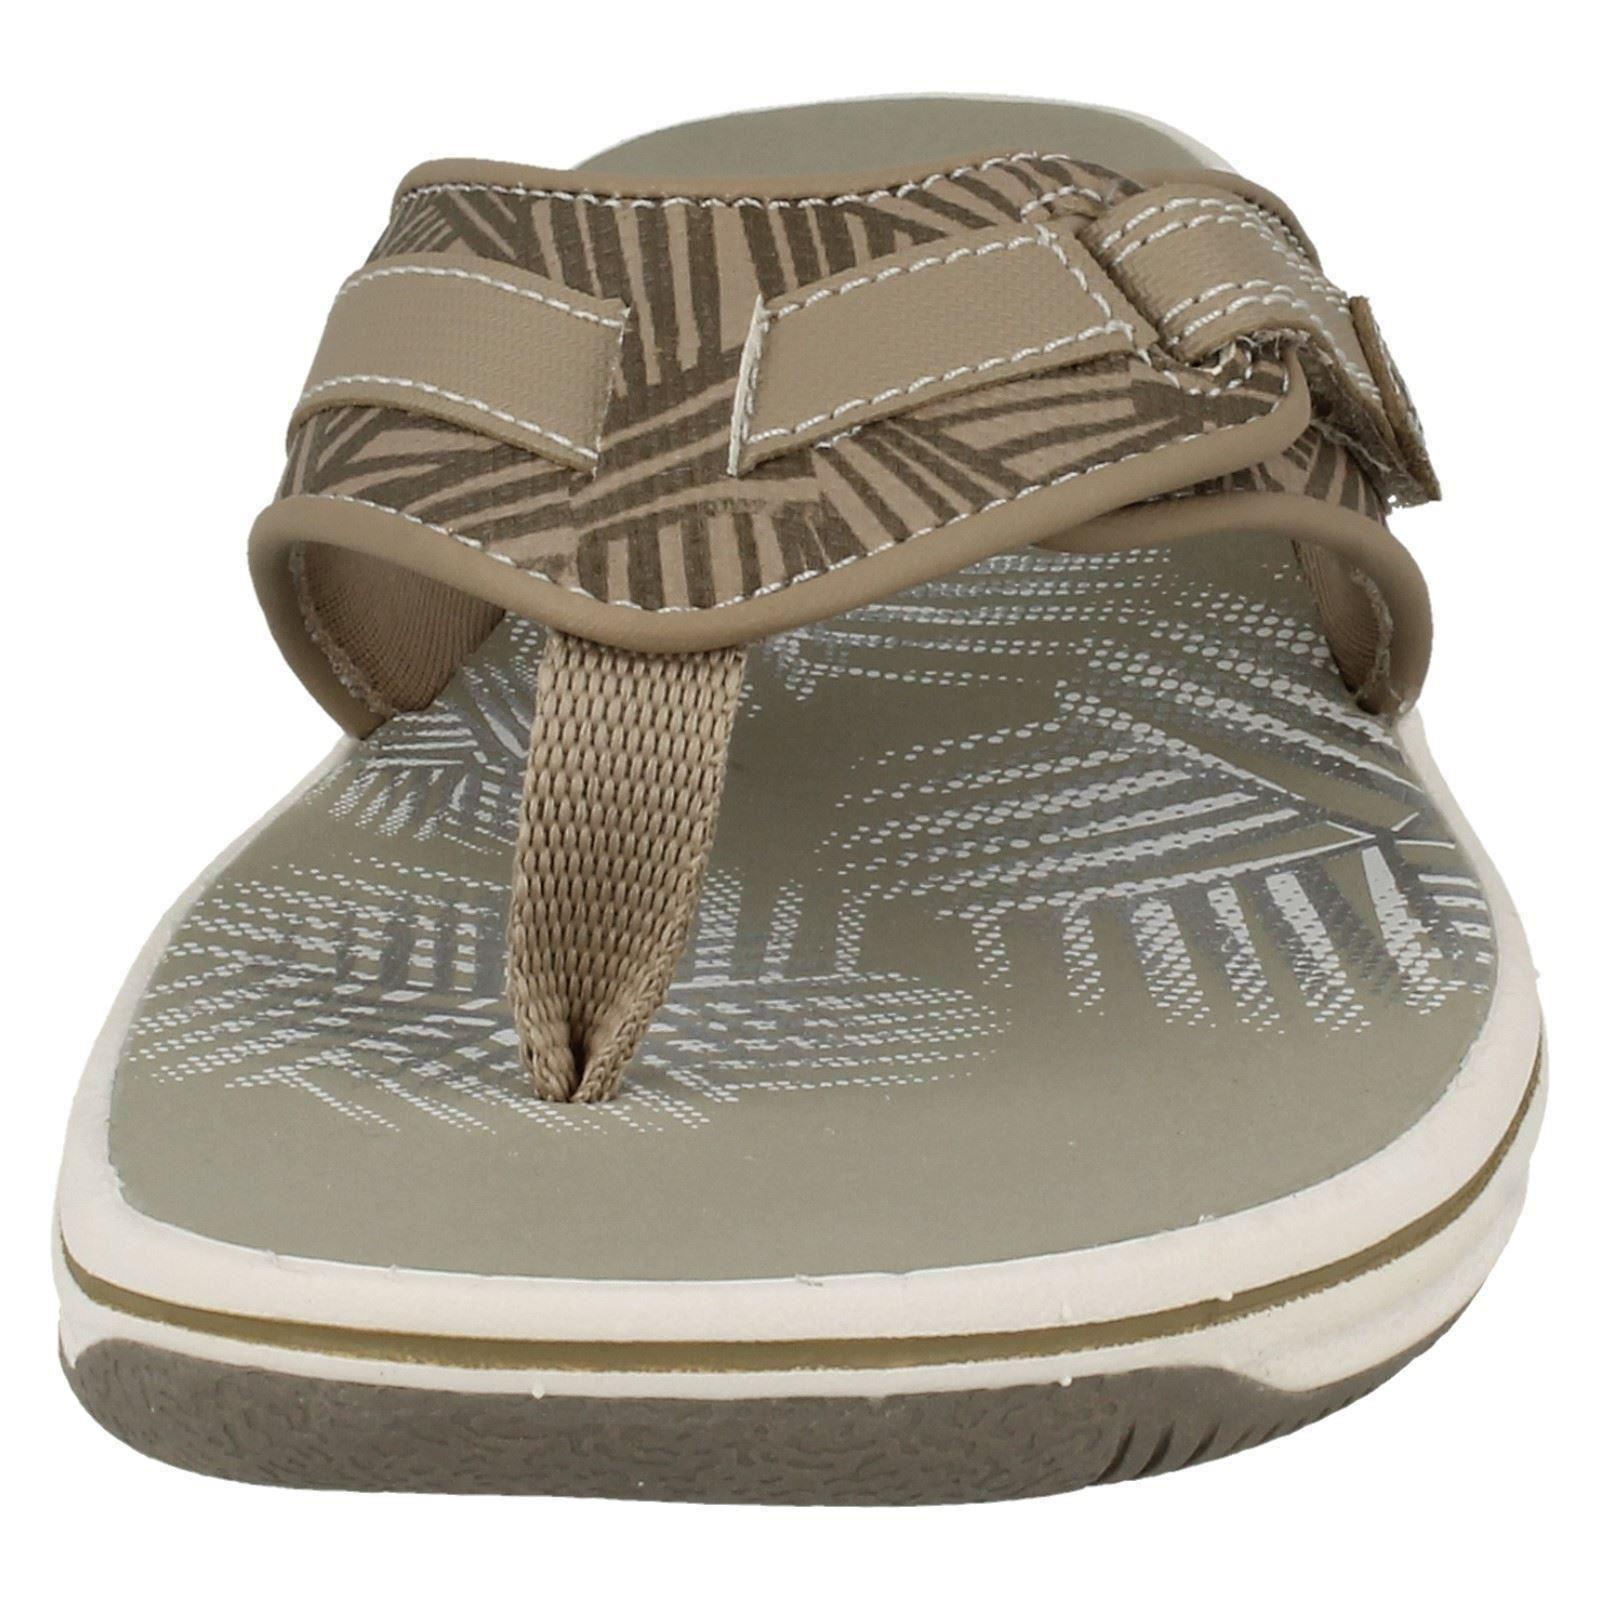 Sandalias de verano señoras Clarks Toe Post Brinkley Quade